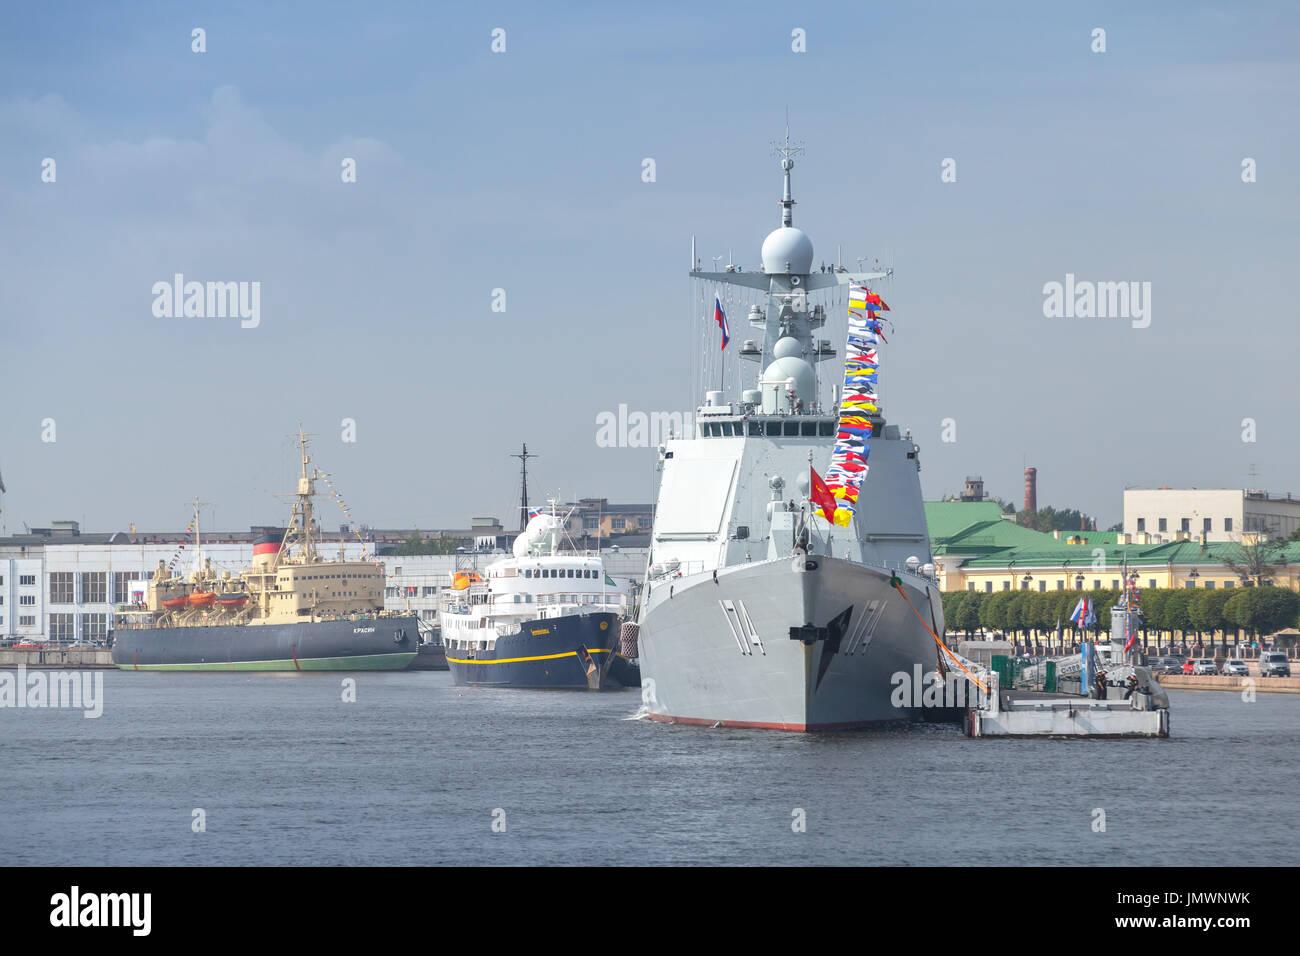 Chinese Navy And Warship Stockfotos & Chinese Navy And Warship ...